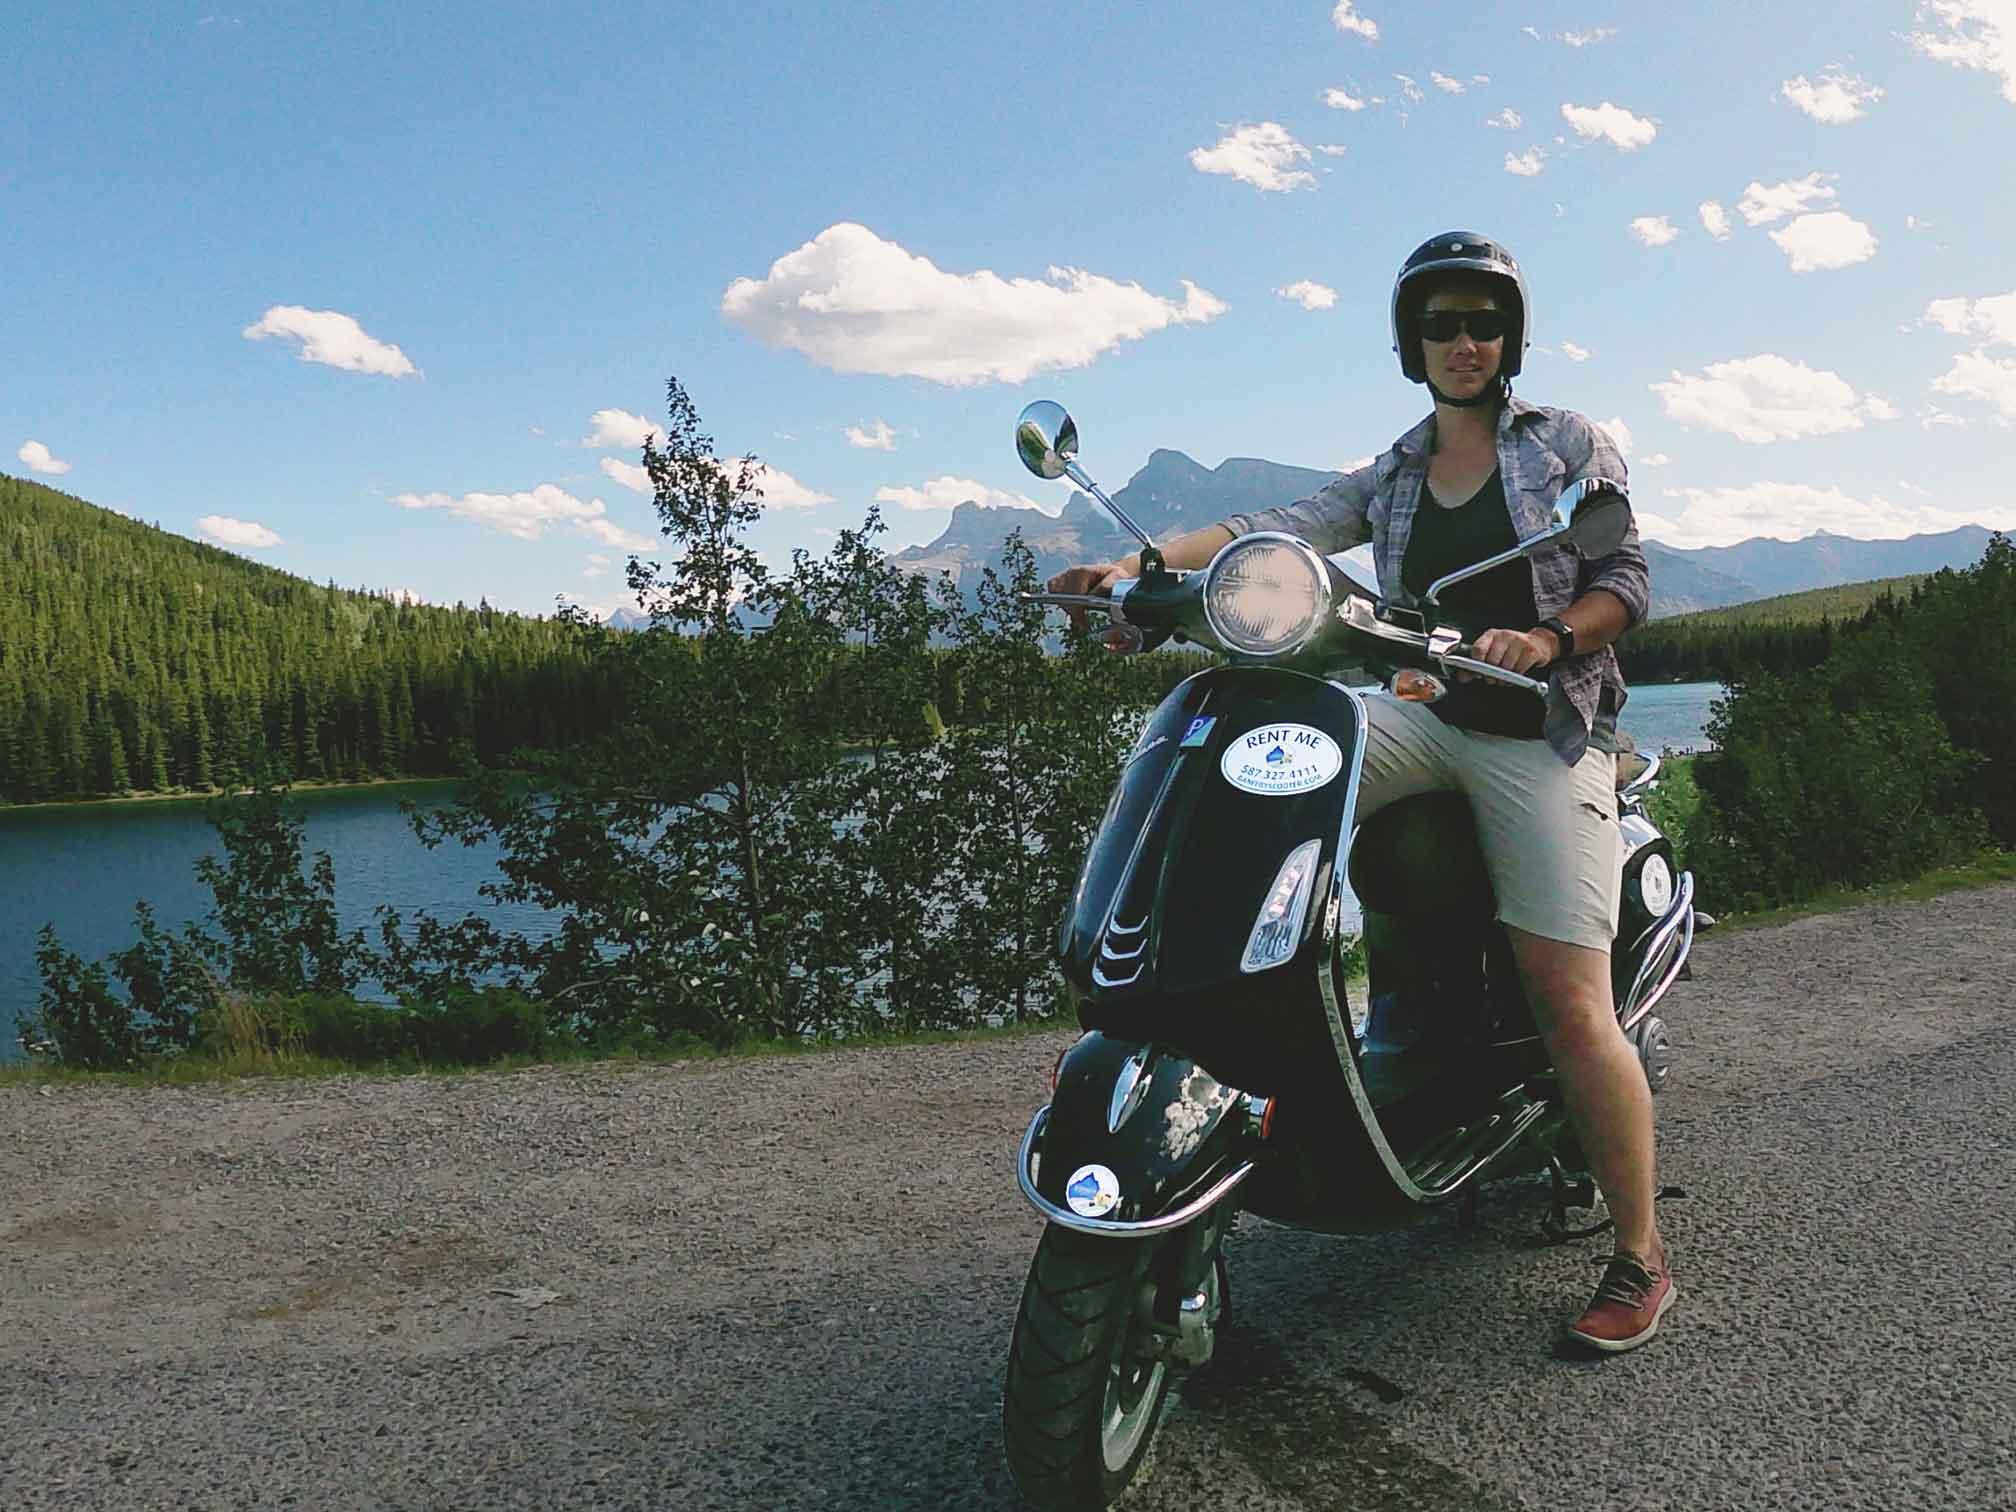 Riding a Vespa at Lake Minnewanka with Banff By Scooter